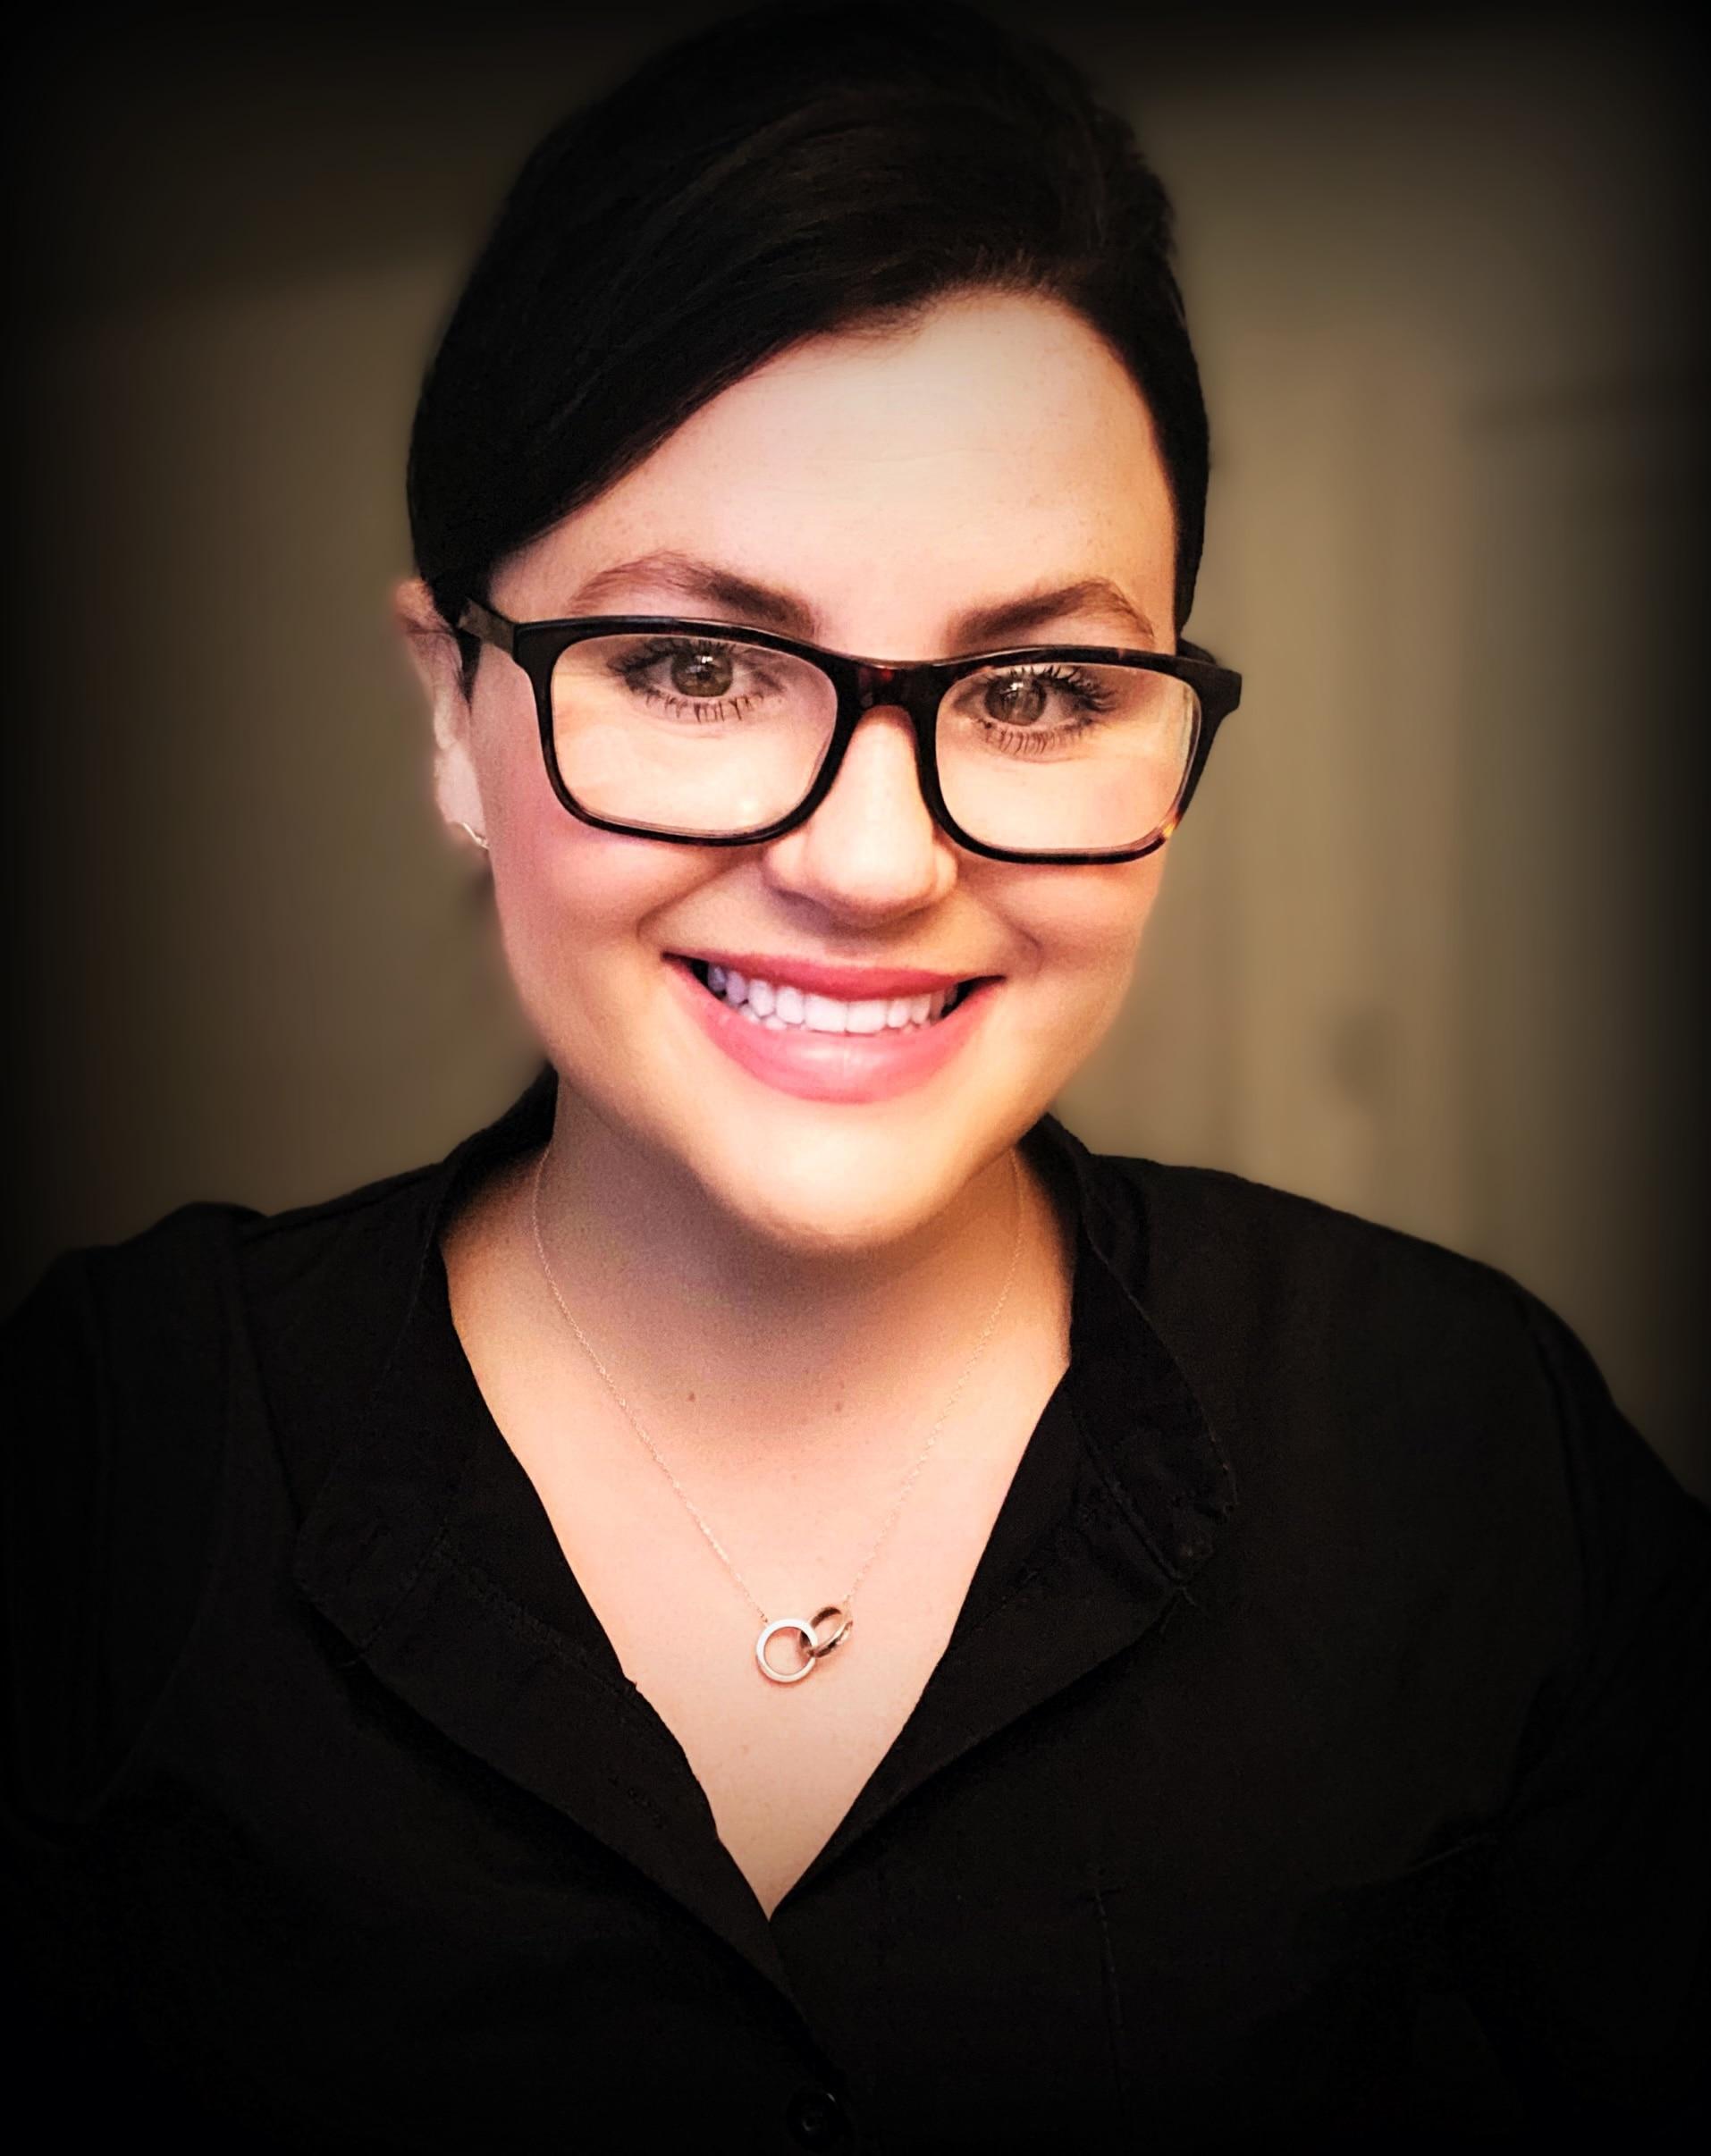 KATIE BRUPBACHER Financial Professional & Insurance Agent